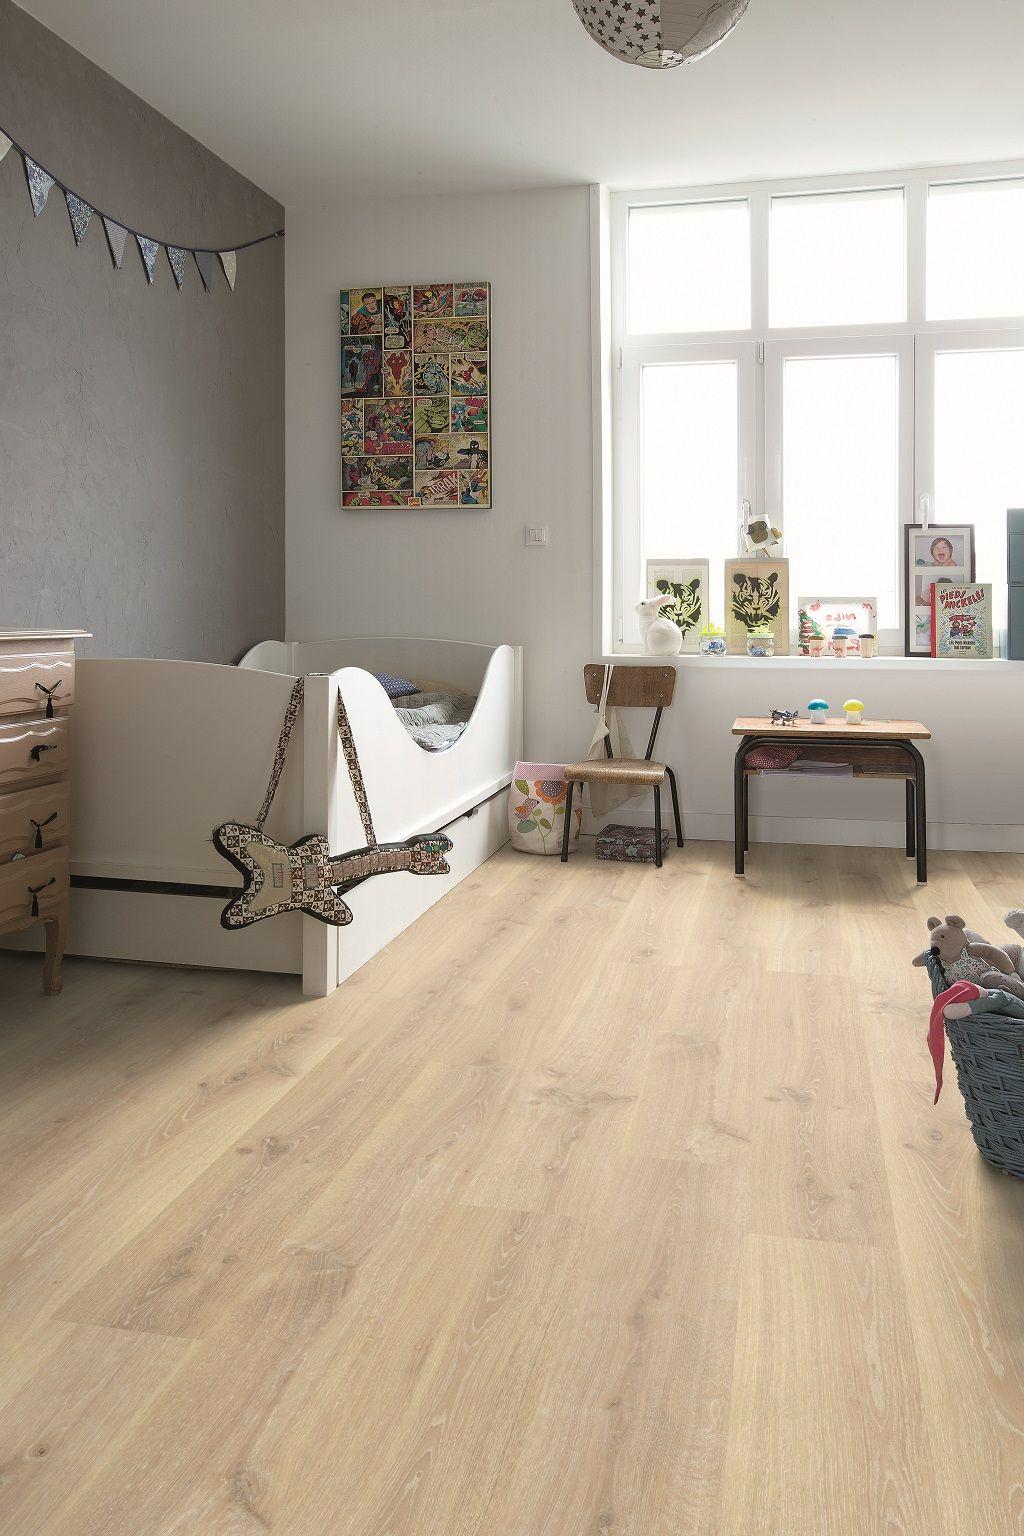 QuickStep Laminate Flooring Creo 'Tennessee oak light